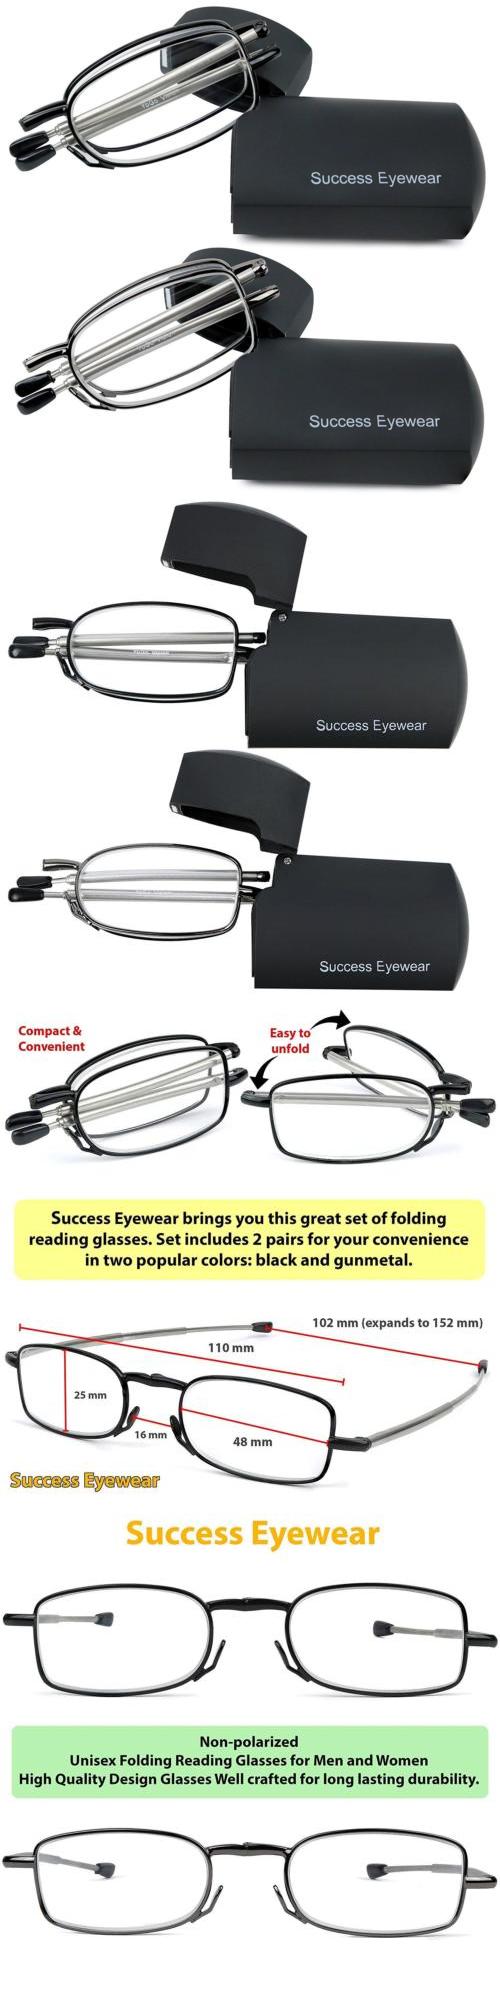 2e5cd37c25b Reading Glasses  Reading Glasses 2 Pair Black And Gunmetal Readers Compact  Folding Unisex For.